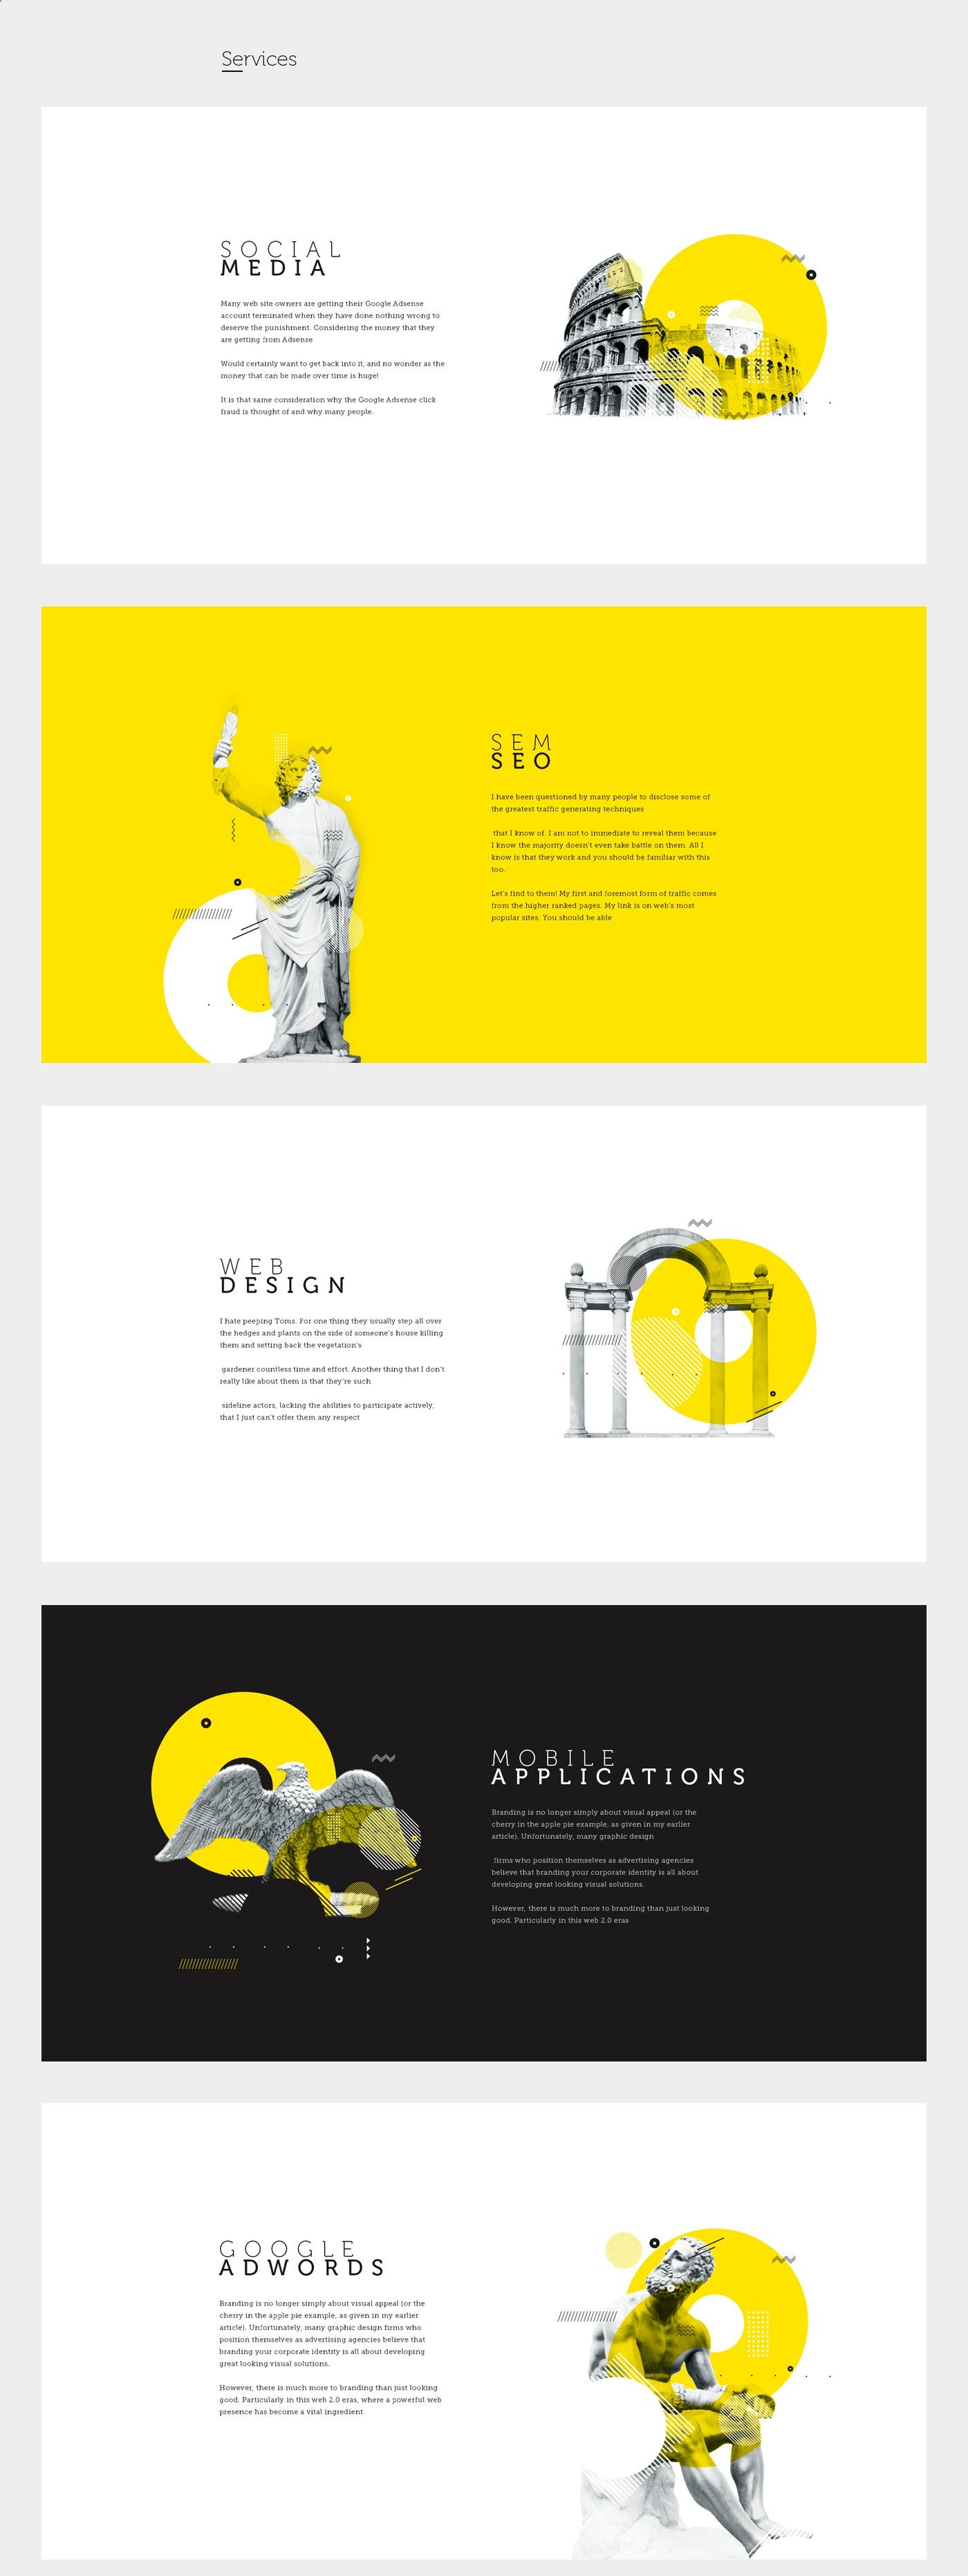 Lawrence Boone Selections On Behance Webdesign Web Design Design